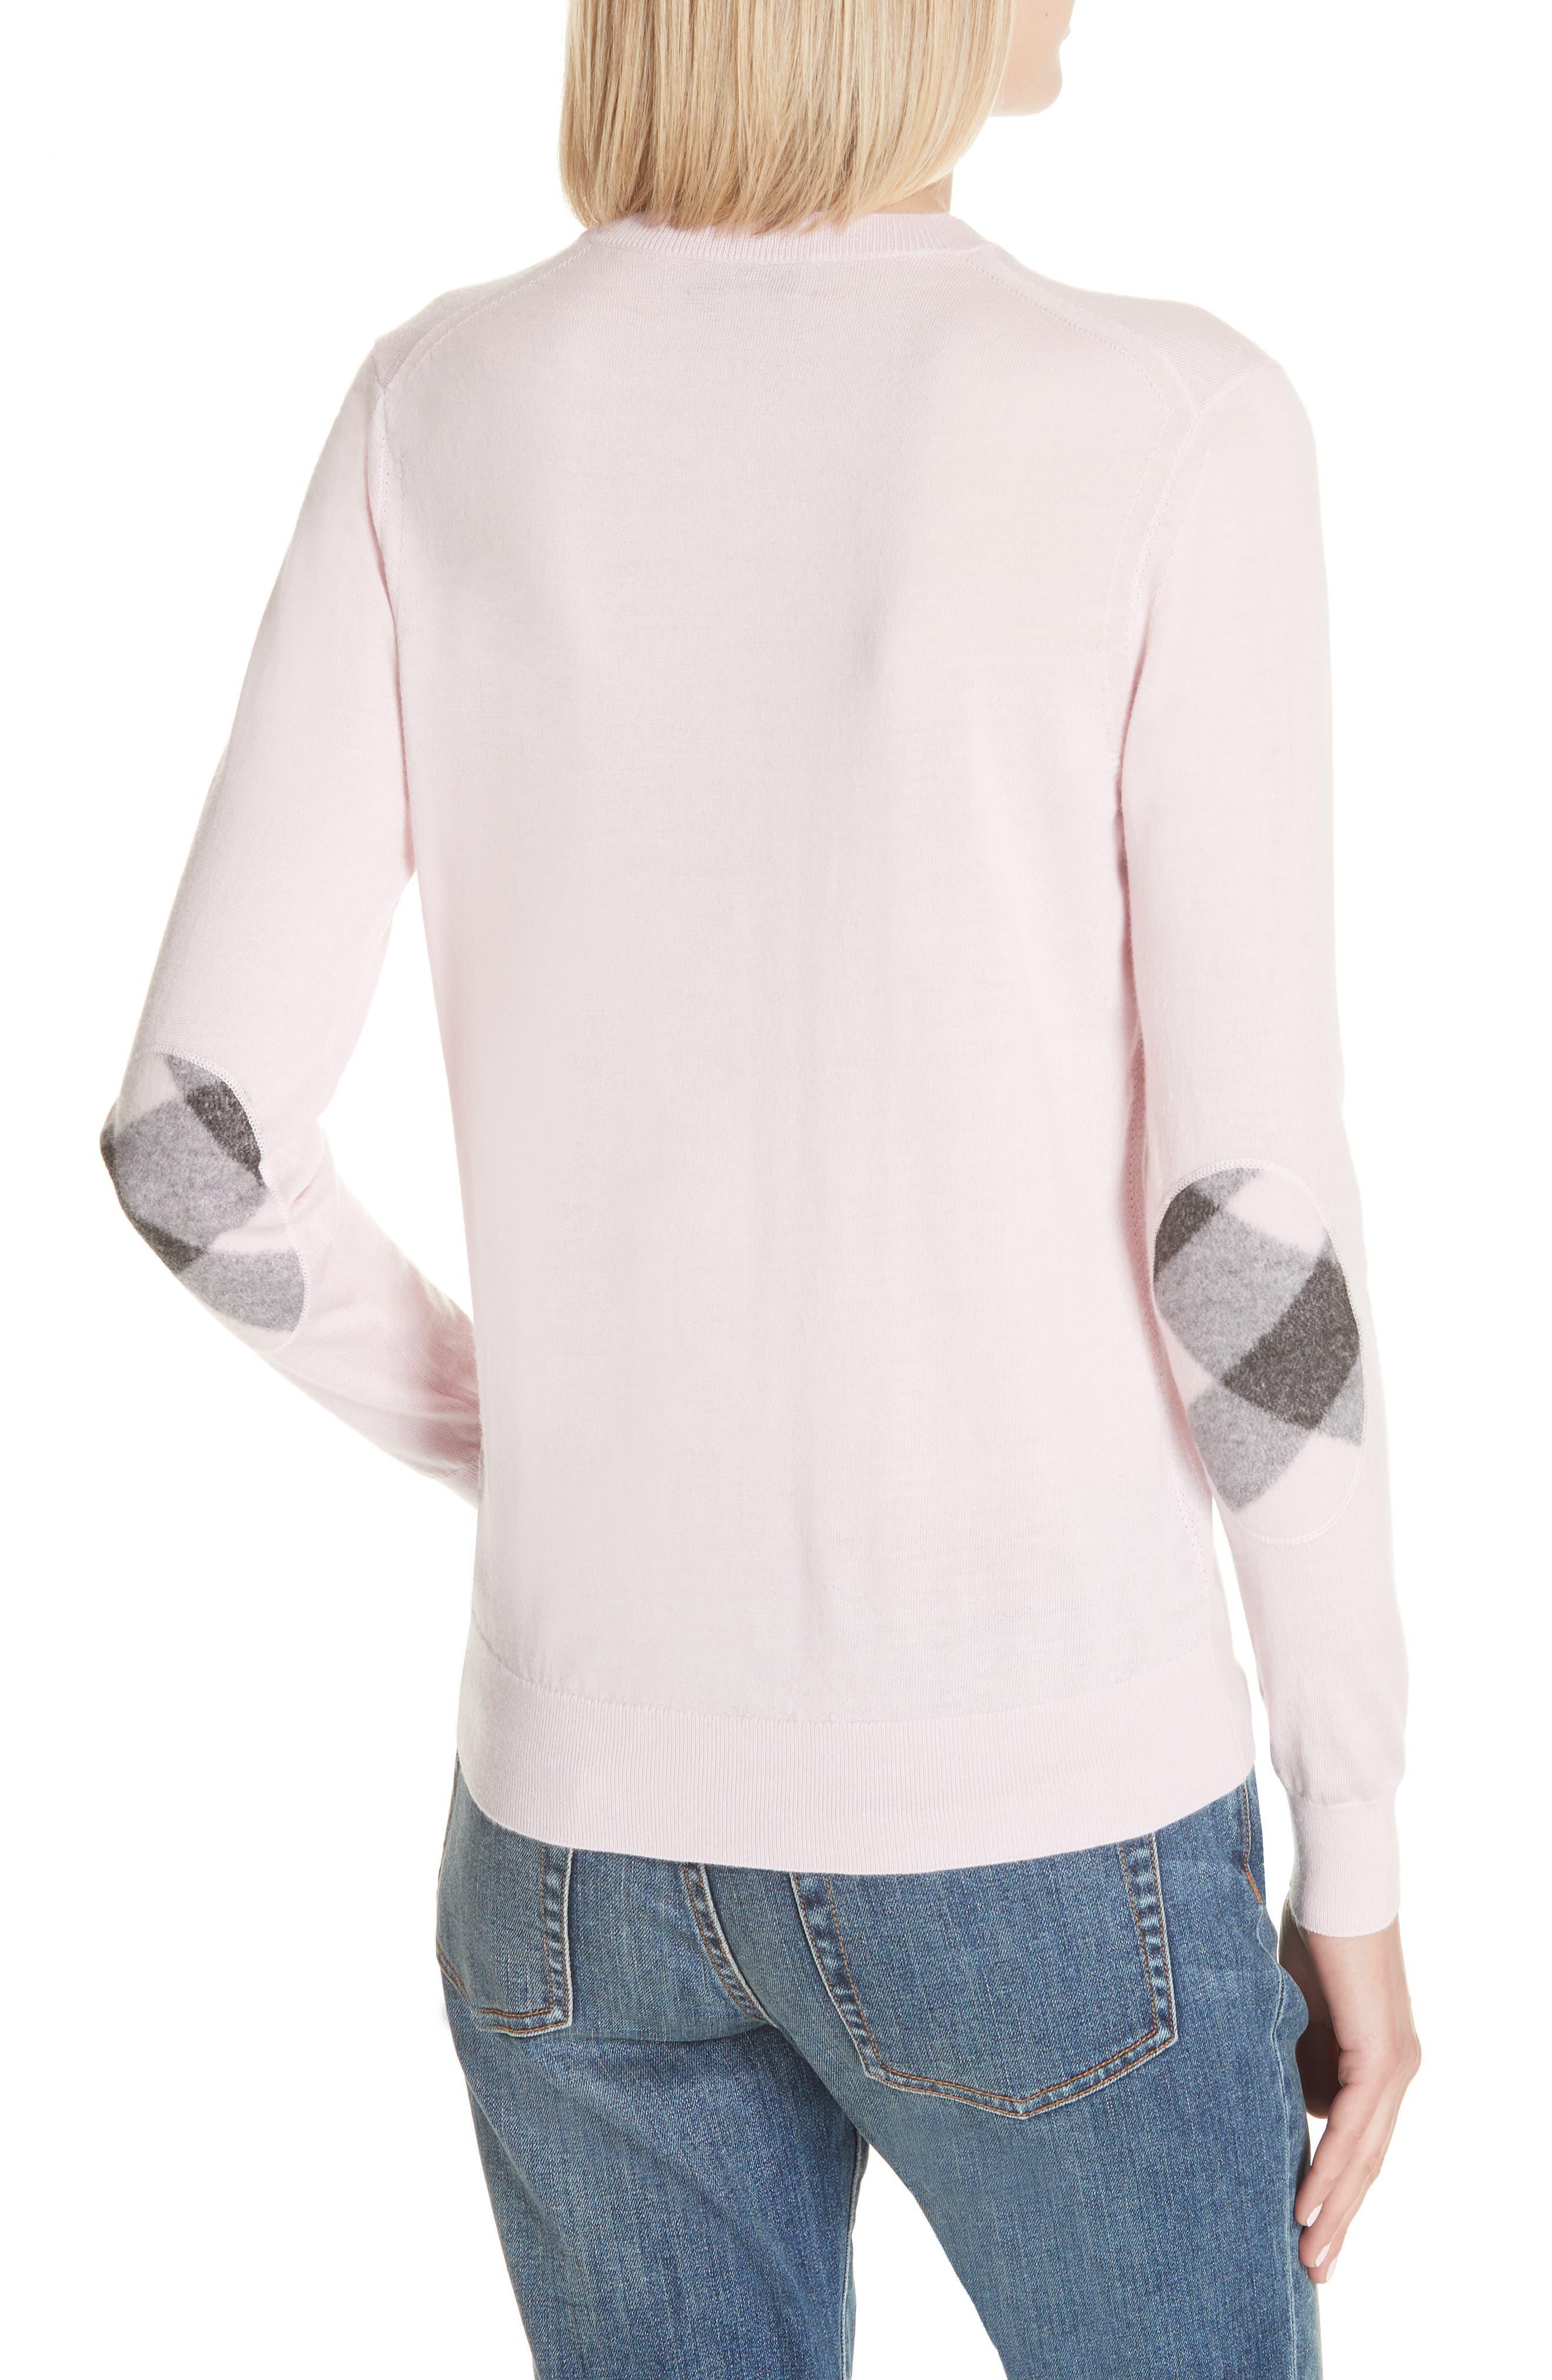 Viar Merino Wool Sweater,                             Alternate thumbnail 4, color,                             Light Pink